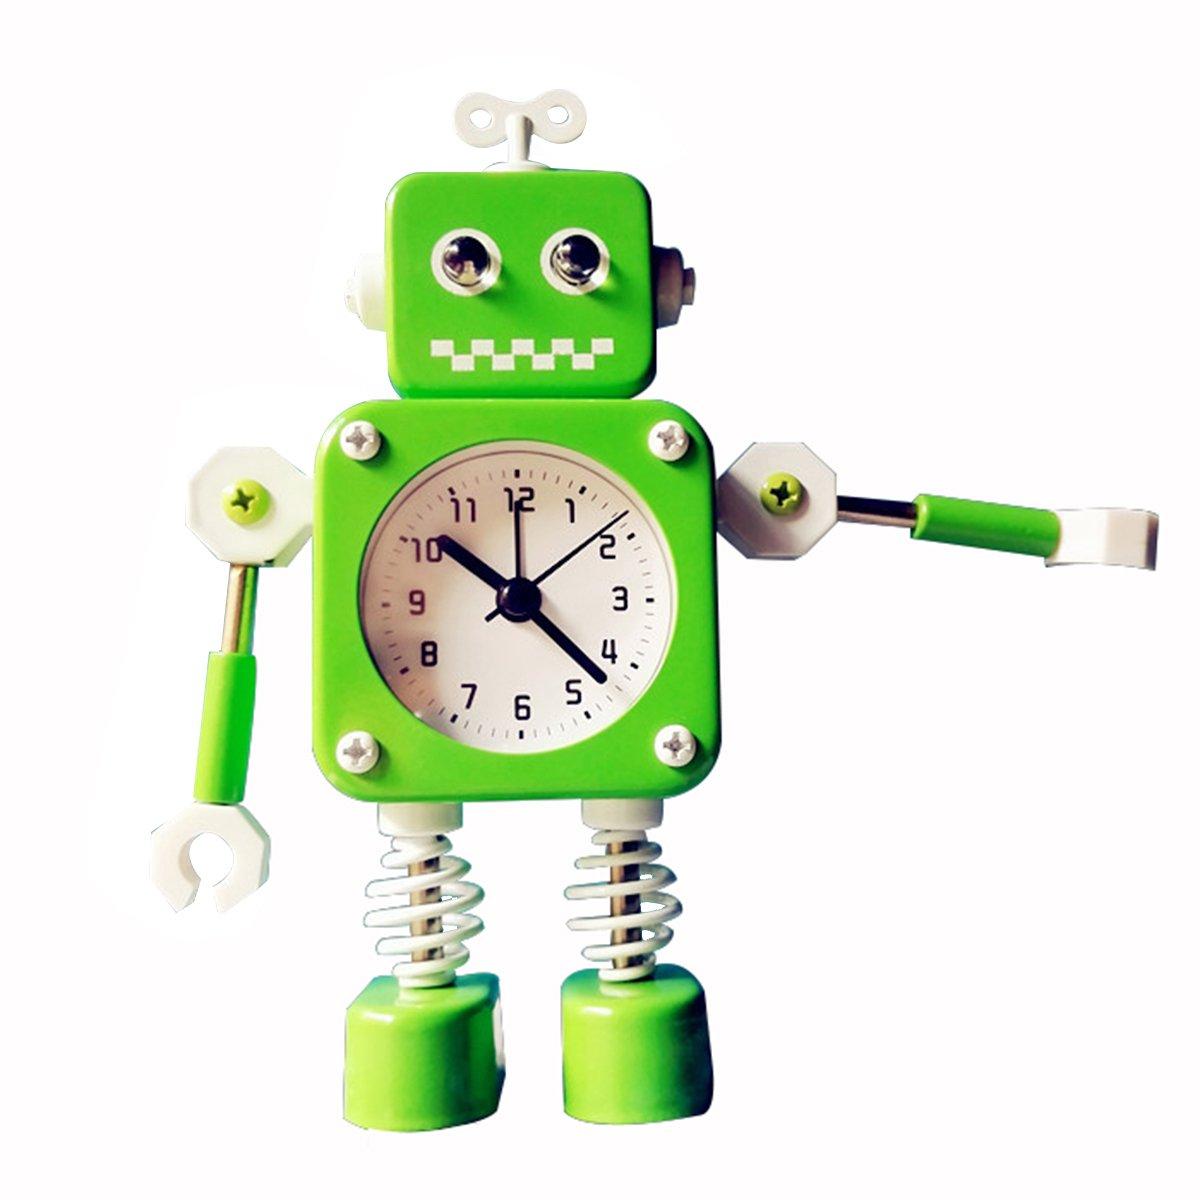 Home Decoration Metal Loud Not-ticking Alarm Clock For -Modern Walking Robot Flash Light Time Clocks (Green)